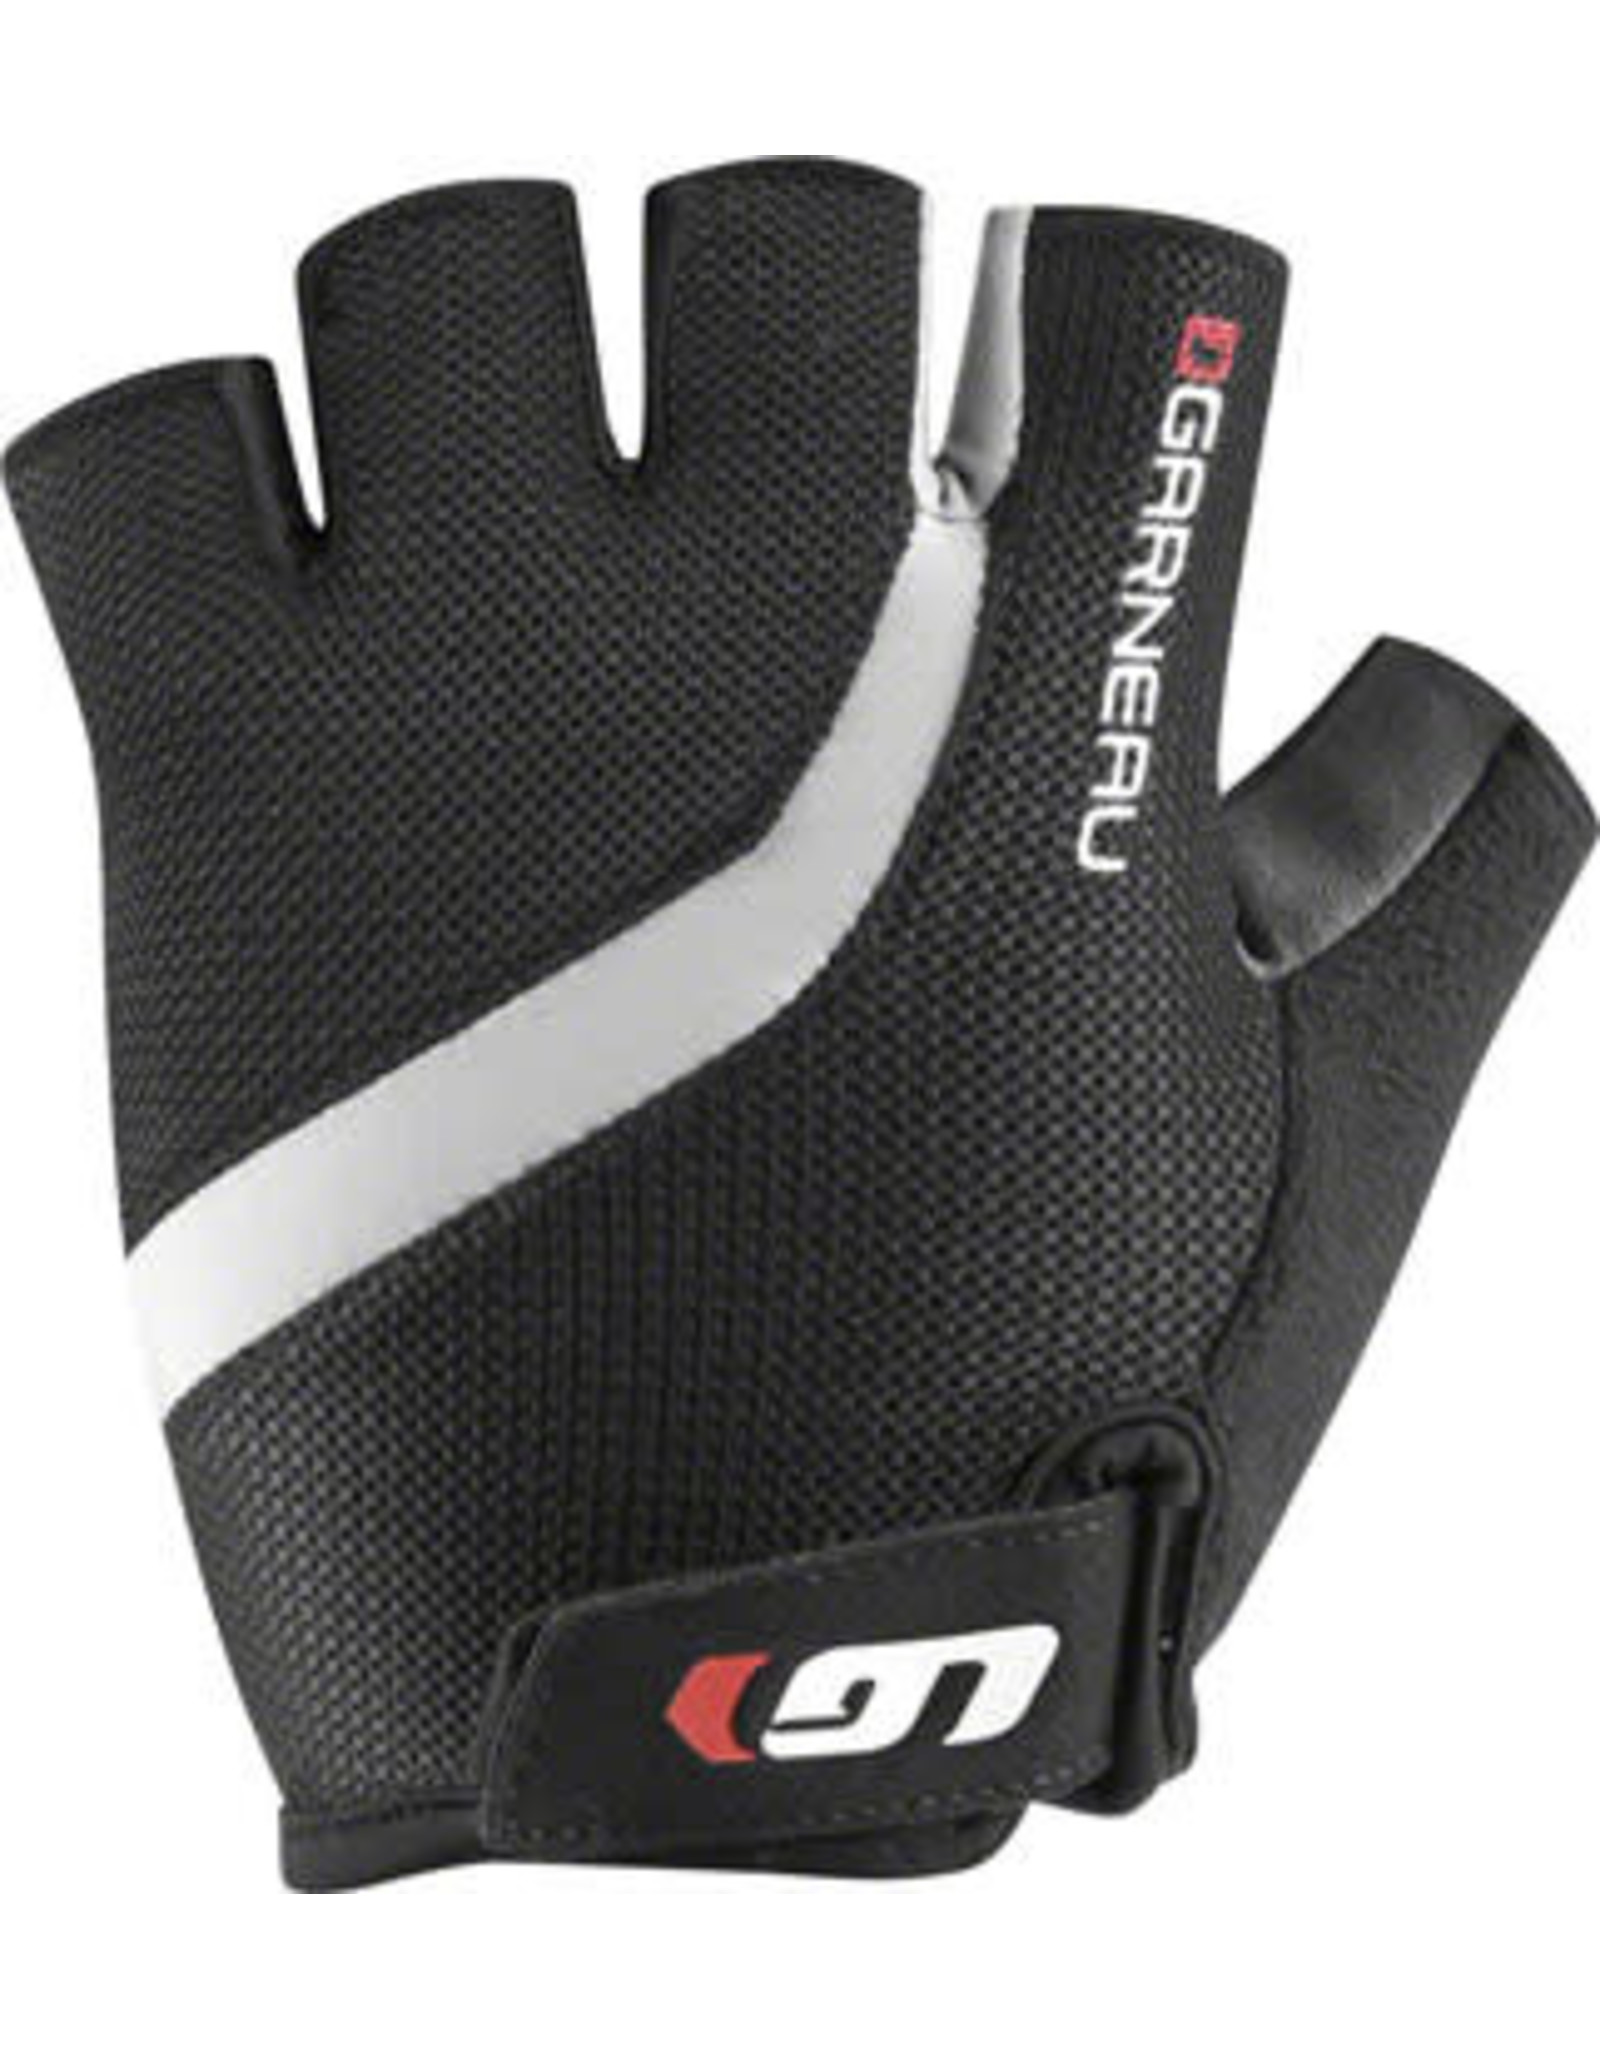 Garneau Biogel RX-V Men's Glove: Black LG